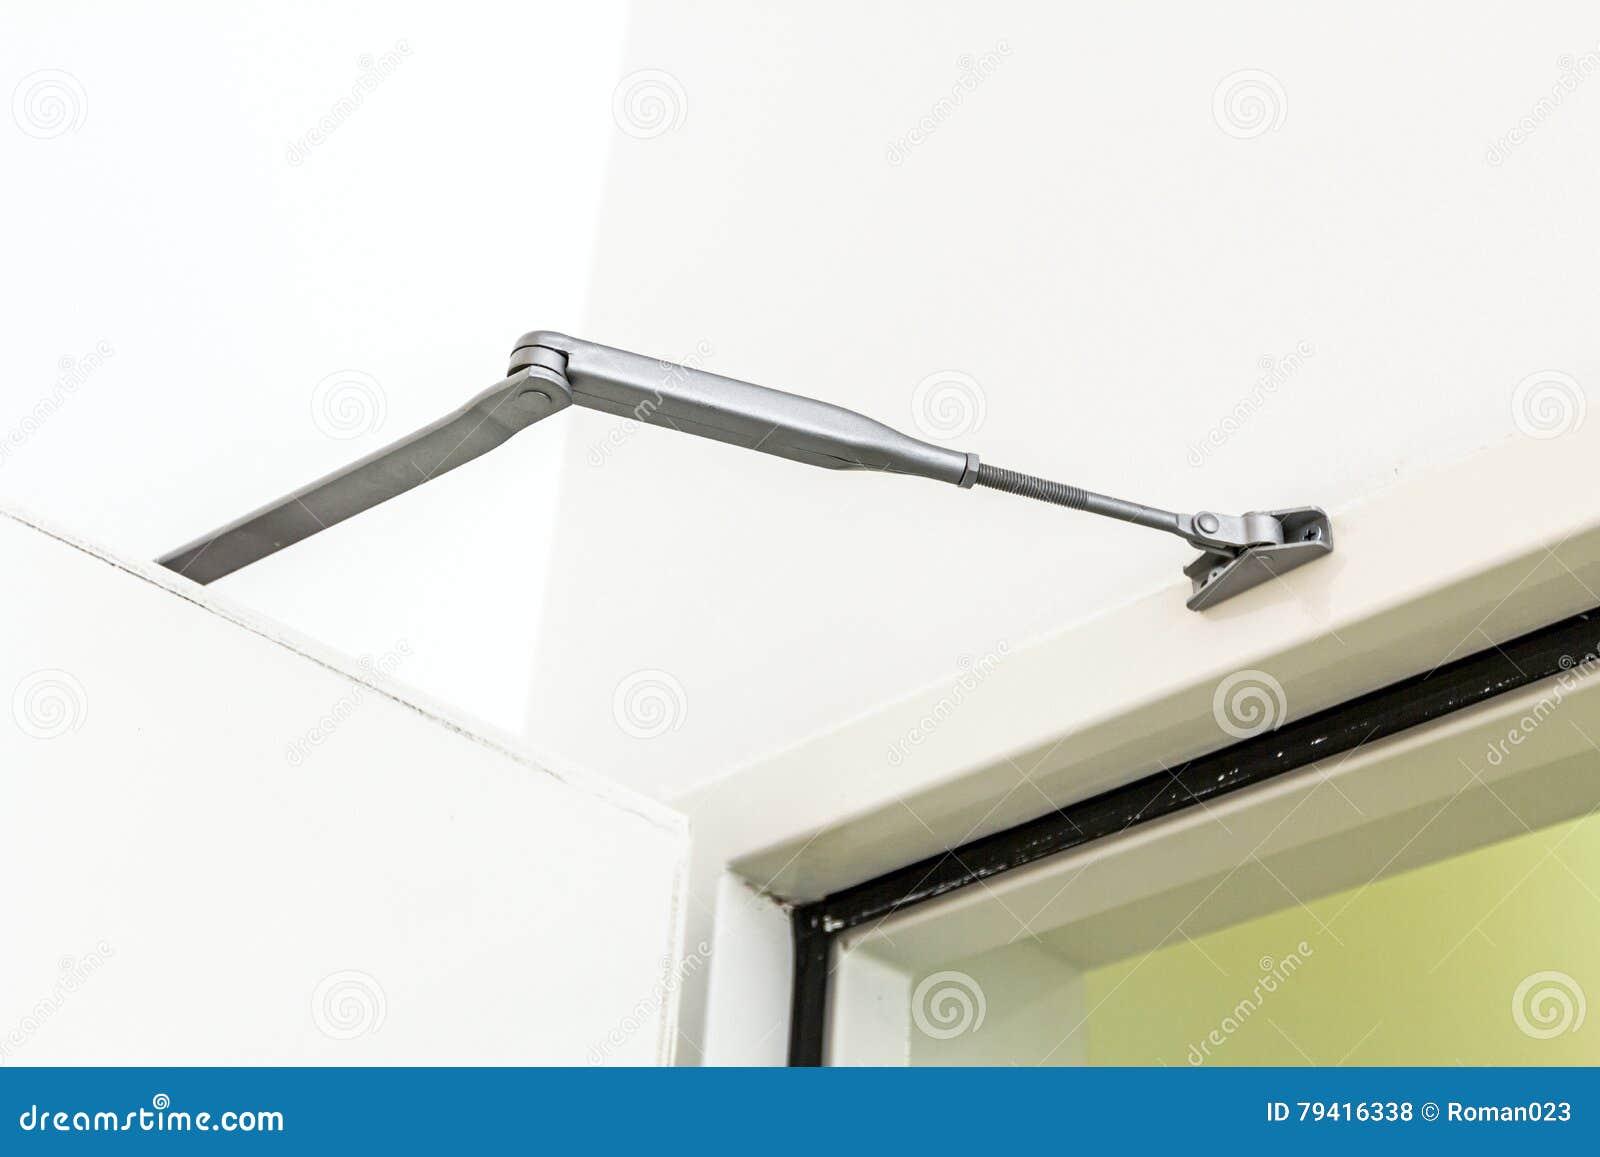 installation de ferme porte ou d 39 amortisseur fermeture. Black Bedroom Furniture Sets. Home Design Ideas